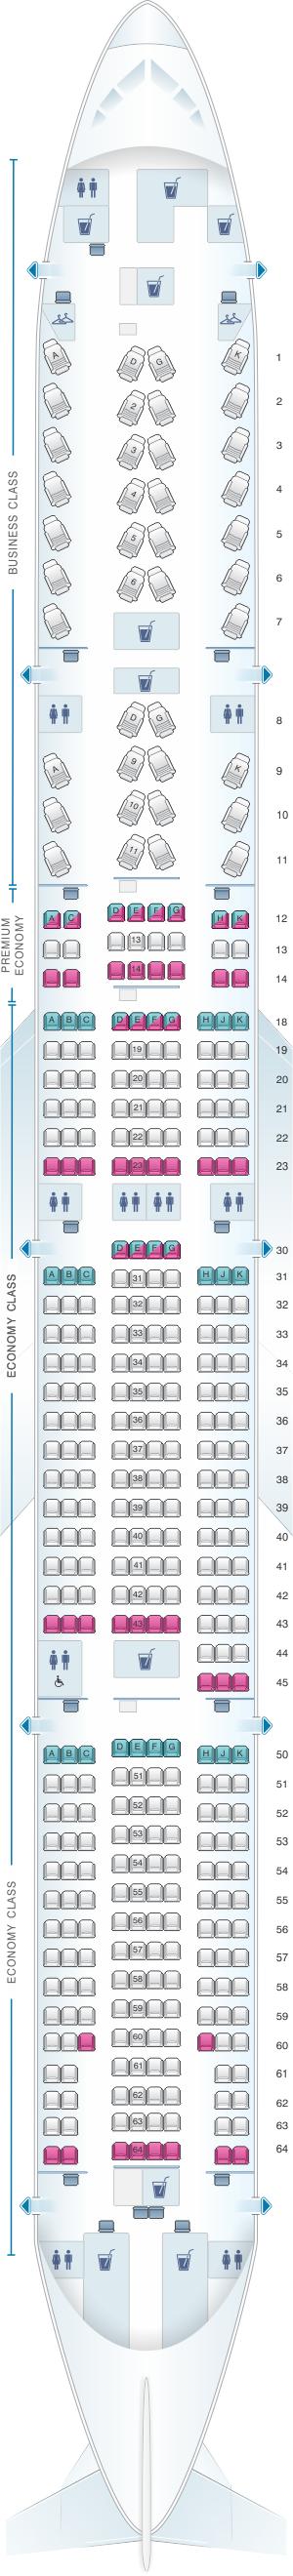 Air Canada 777 Seat Map Seat Map Air Canada Boeing B777 300ER (77W) International Layout 1